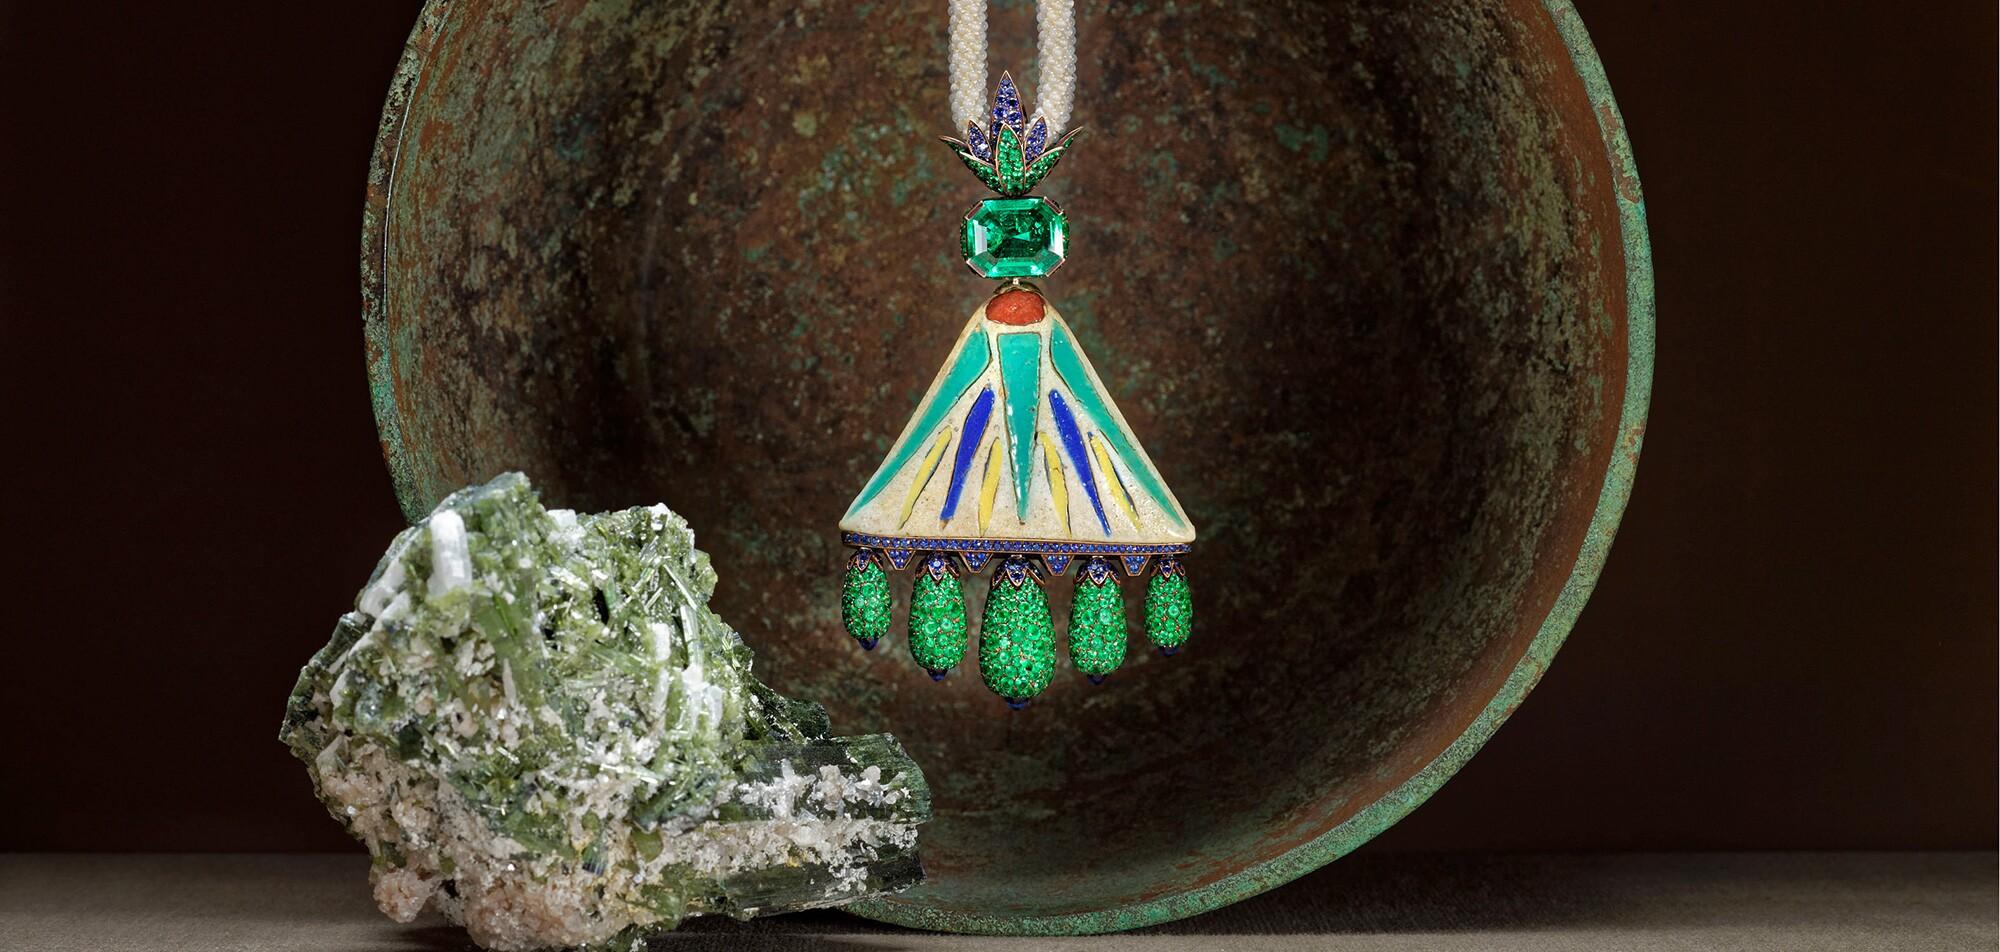 hemmerle-faience-necklace.jpg